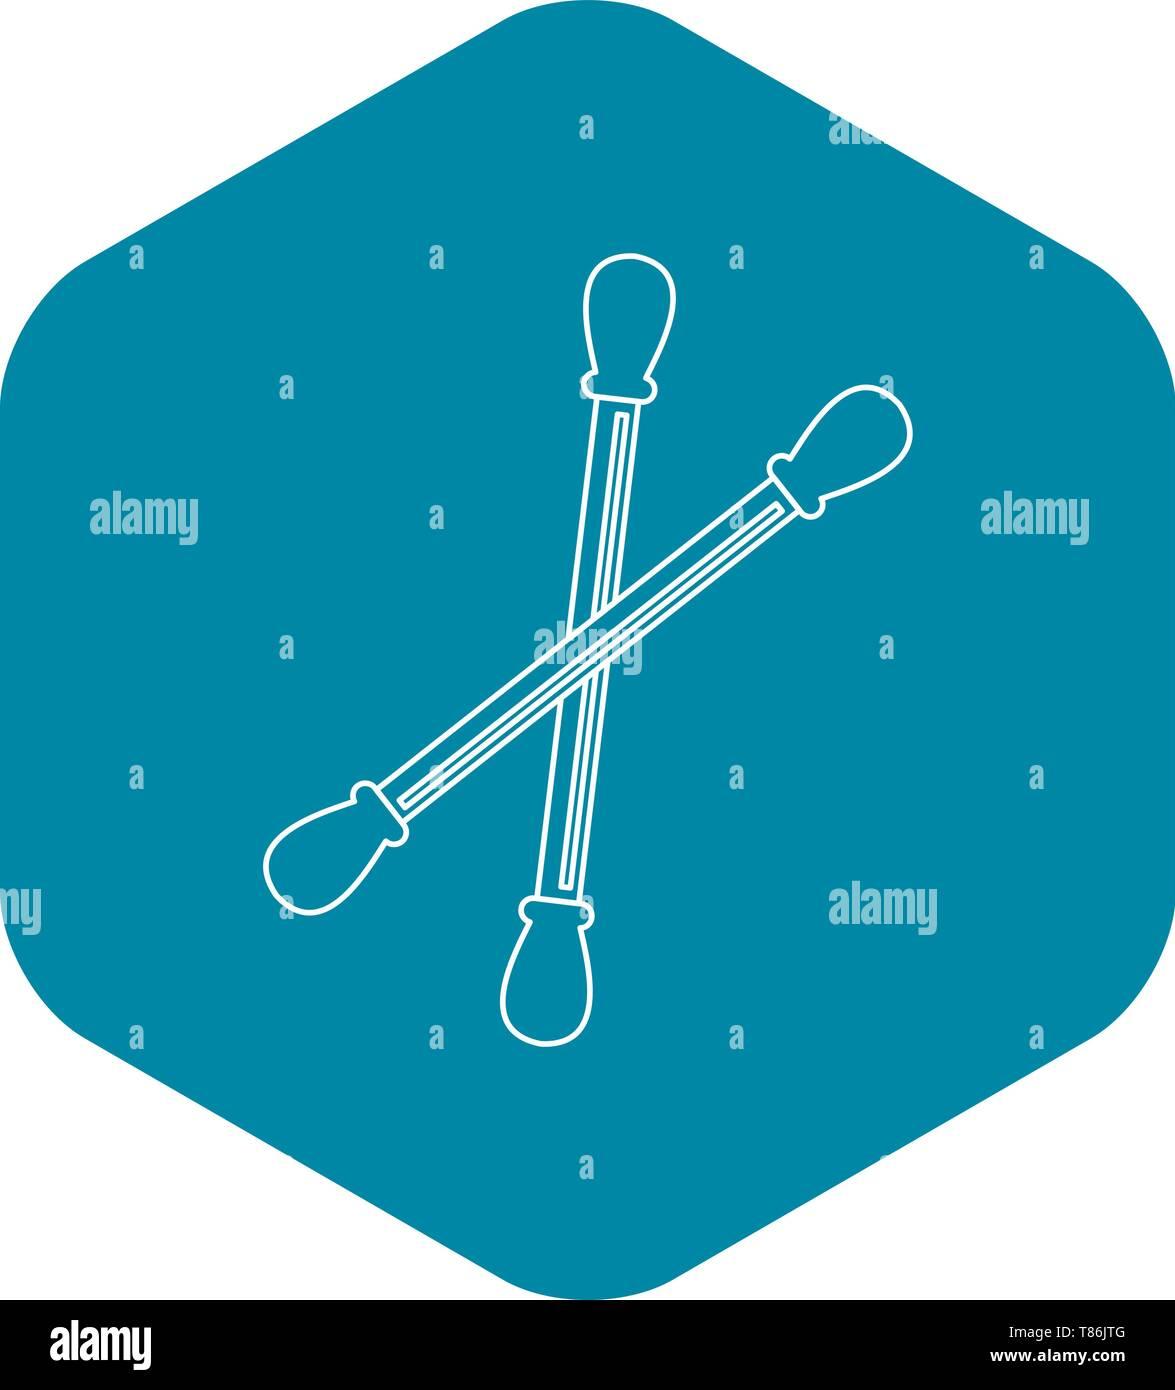 Cotton sticks icon, outline style Stock Vector